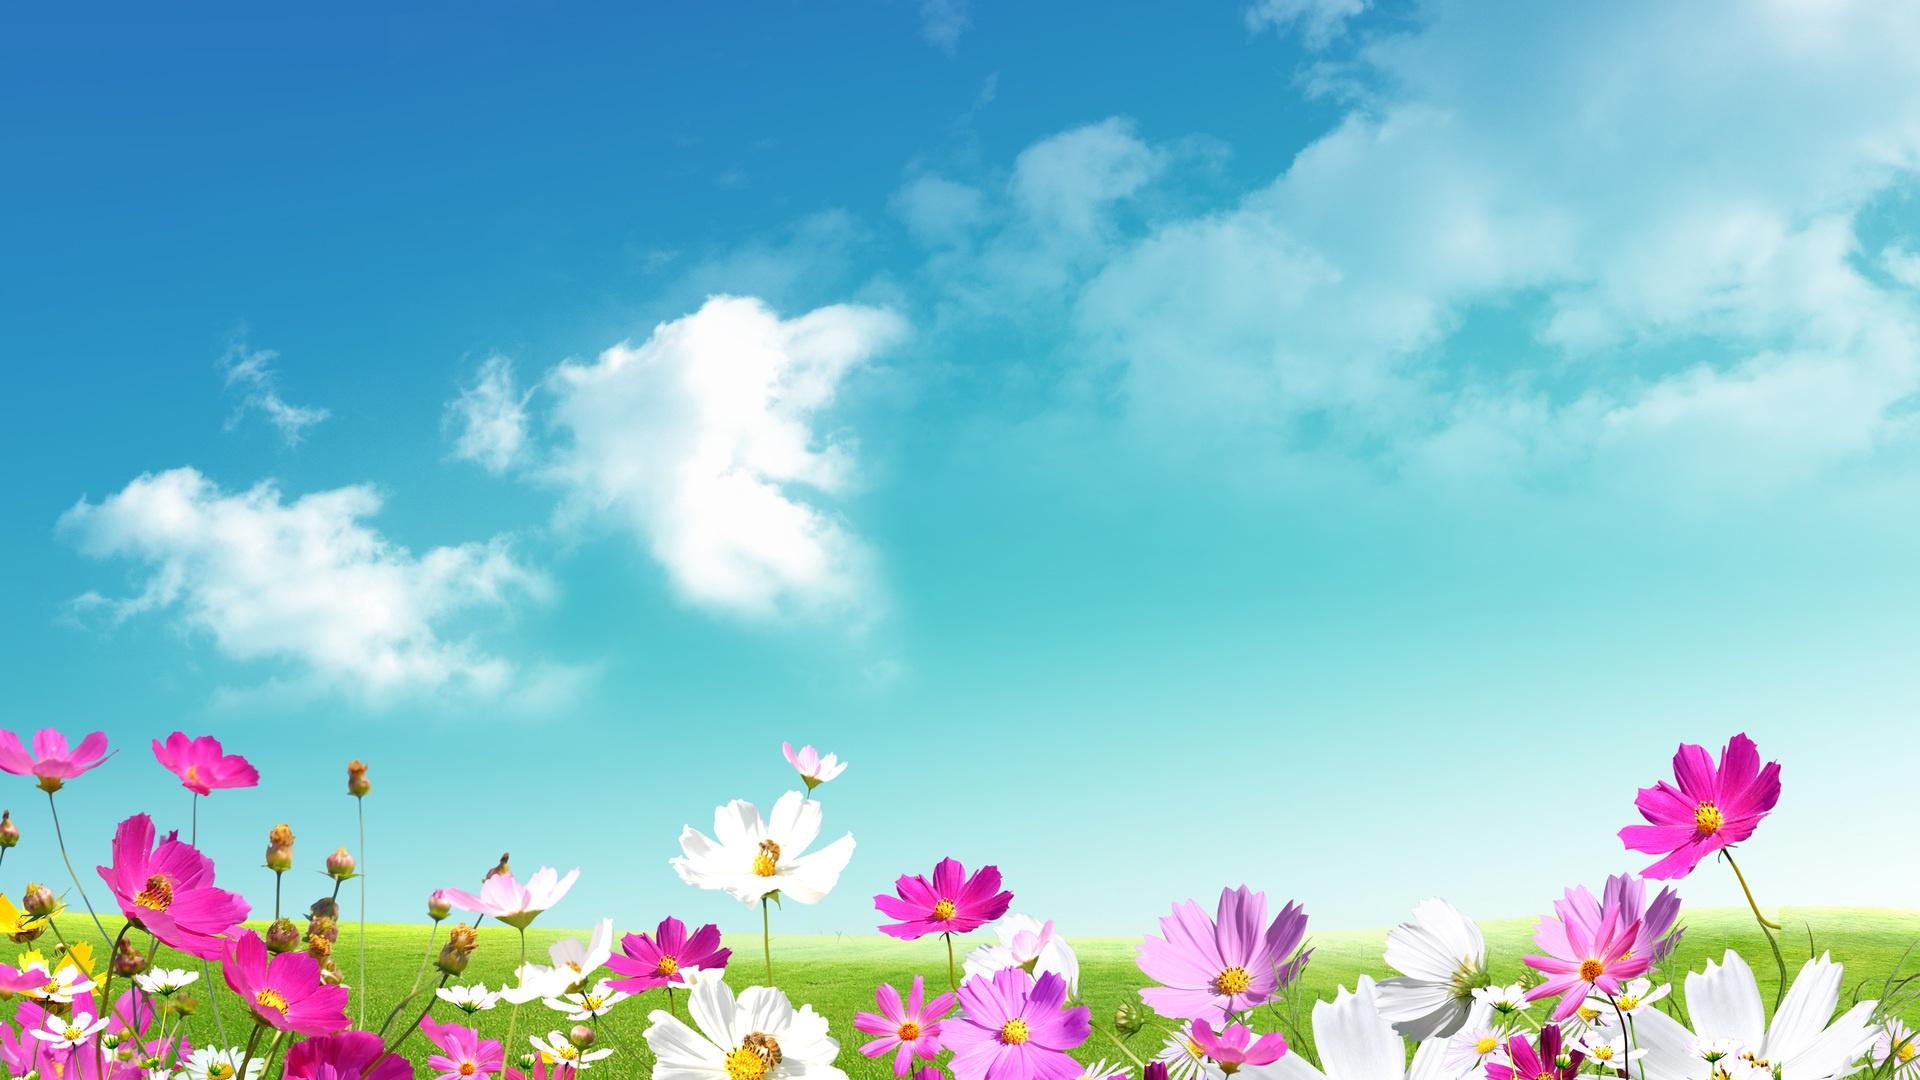 Springtime Background Wallpaper HD